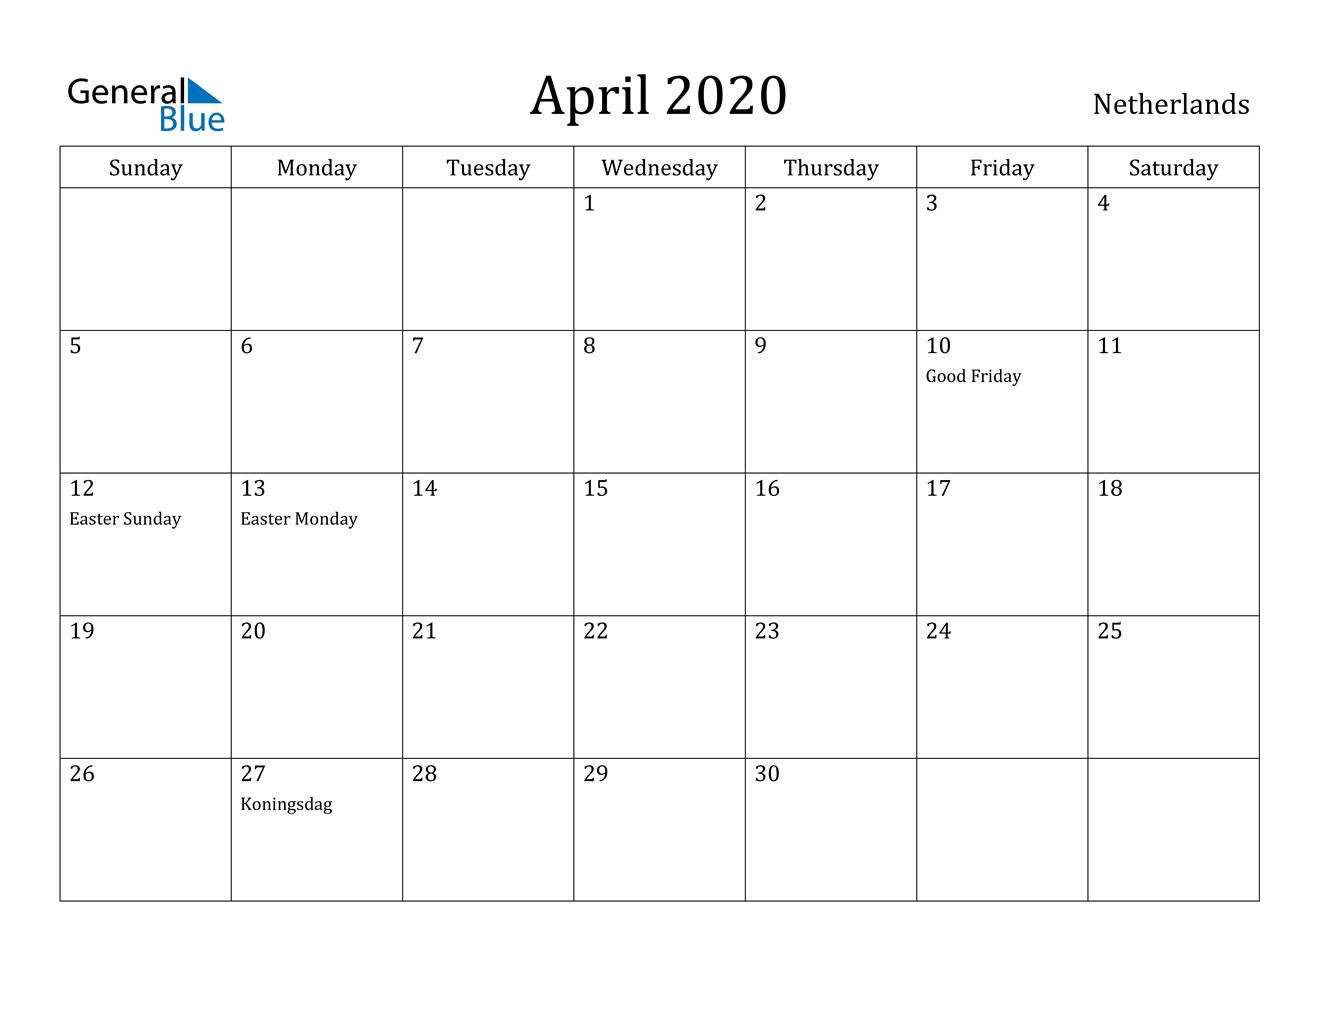 Image of April 2020 Netherlands Calendar with Holidays Calendar